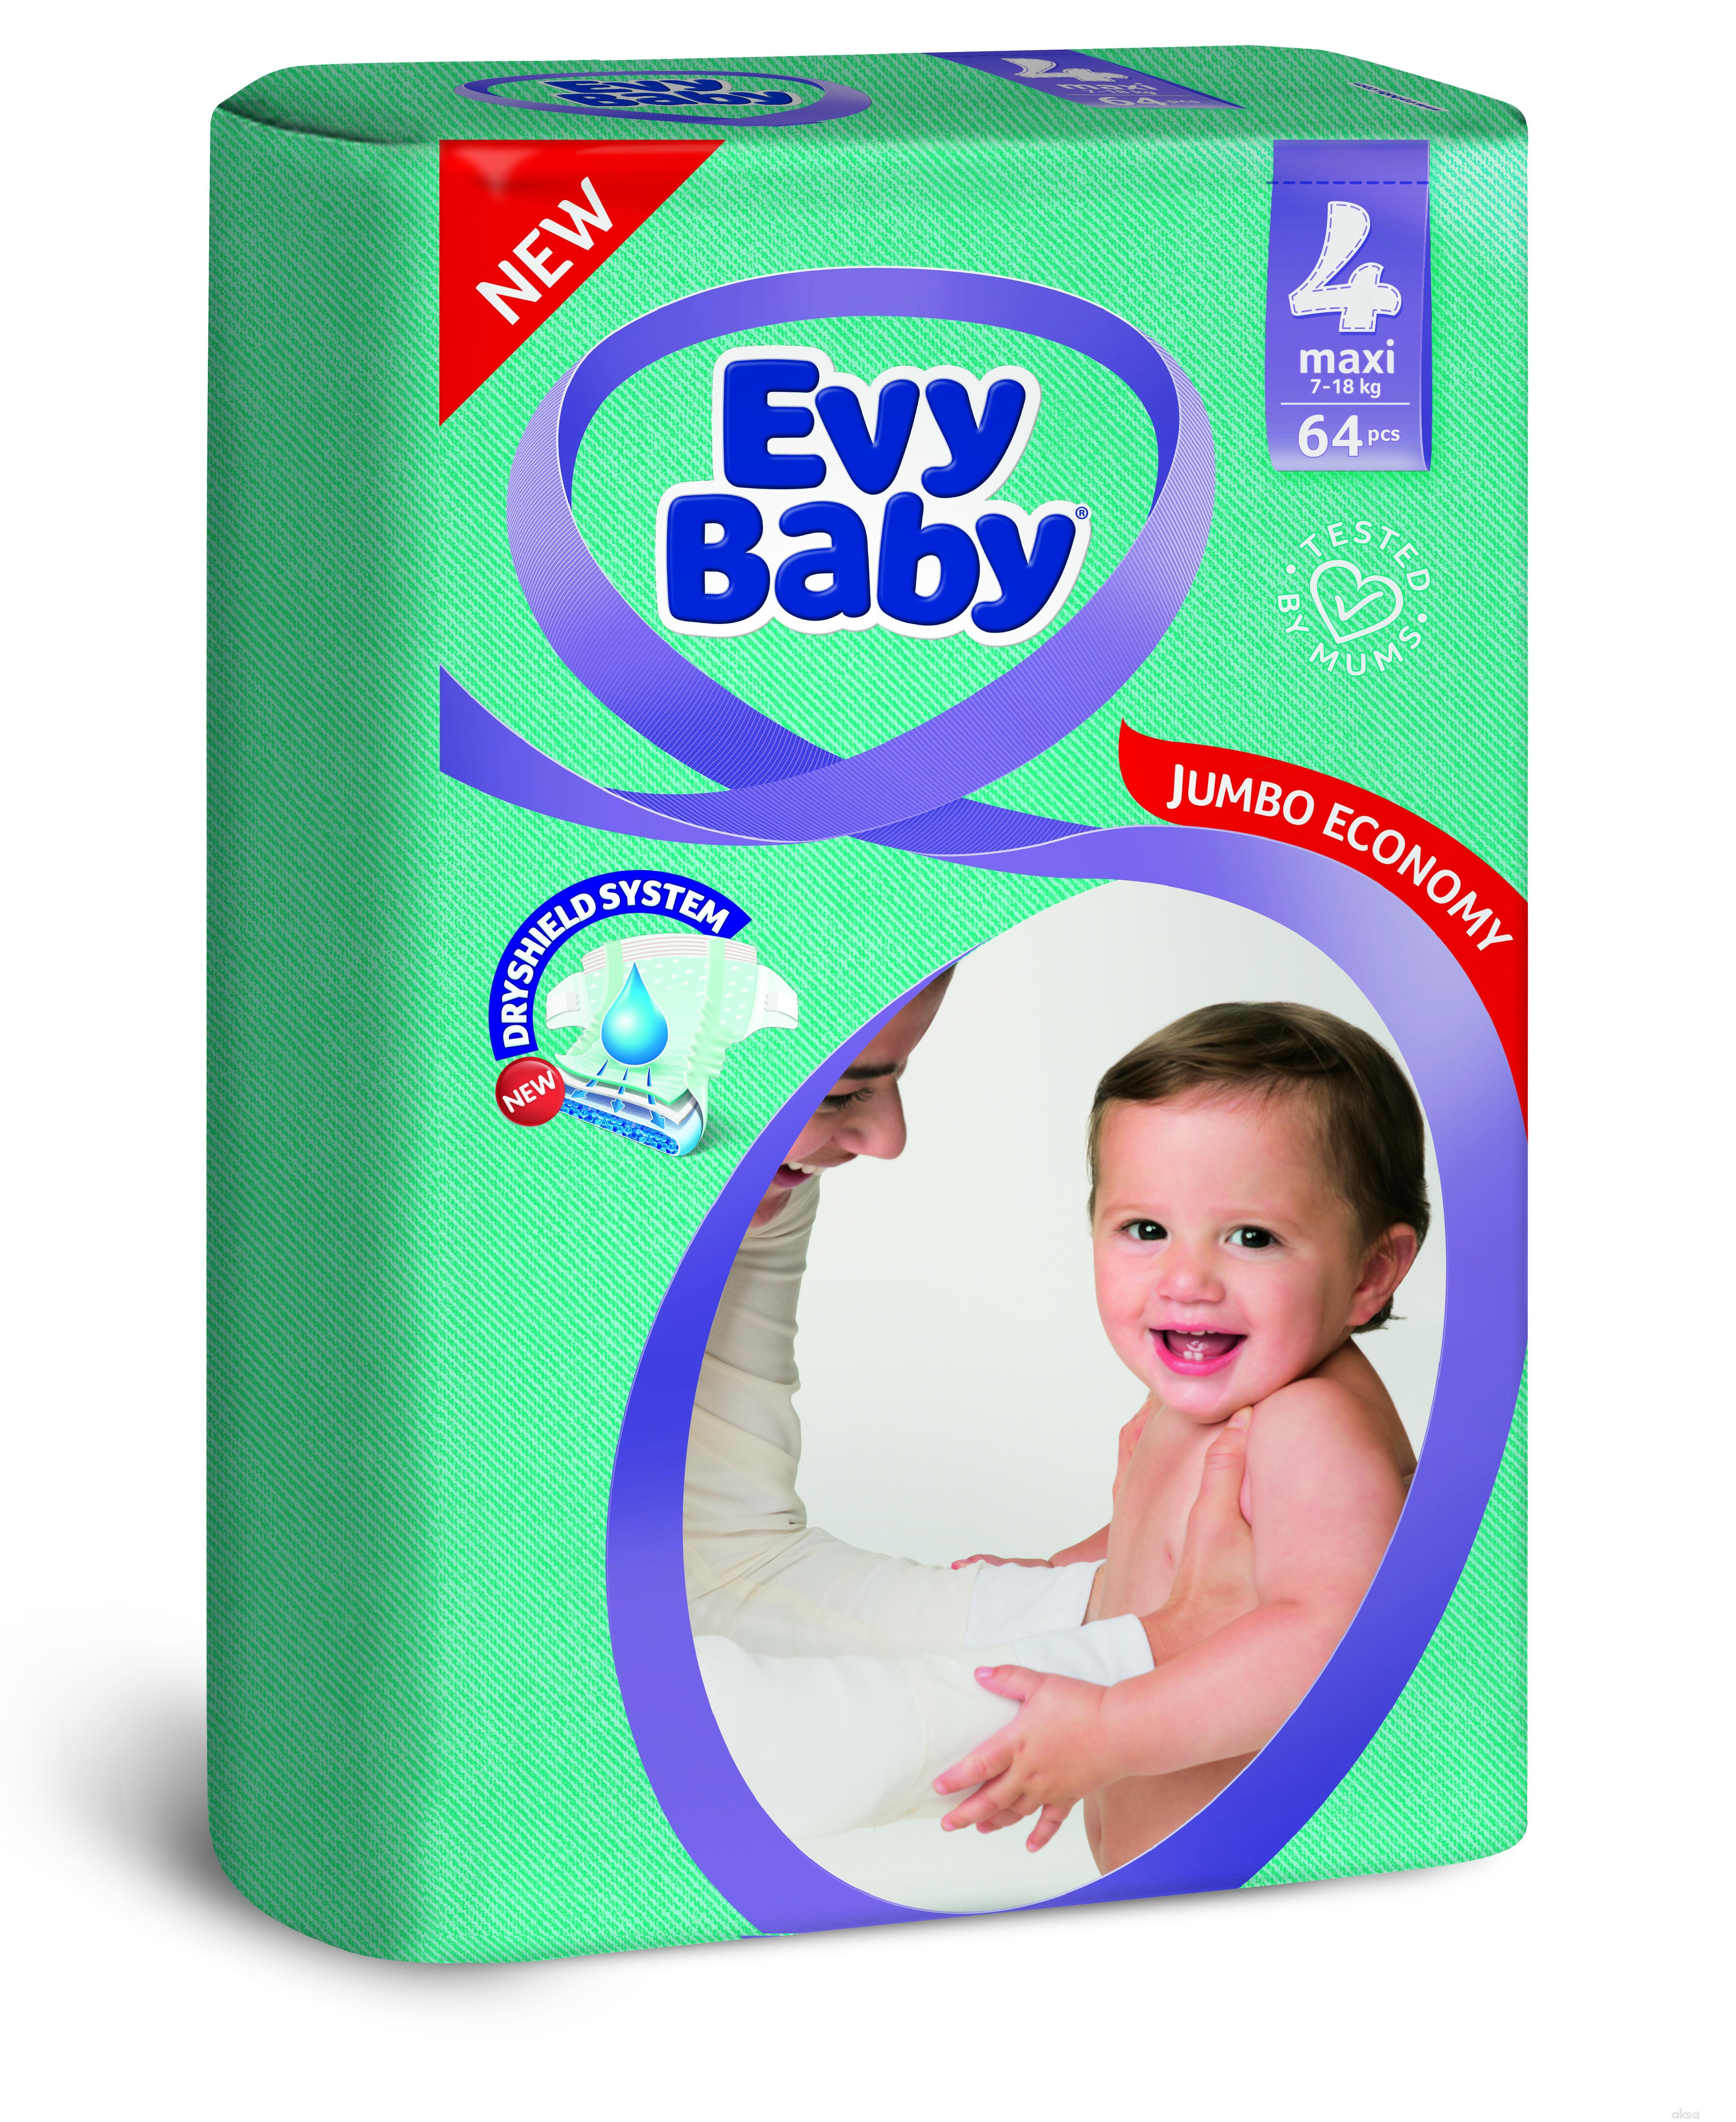 Evy baby pelene jumbo 4 maxi 8-18kg 64kom